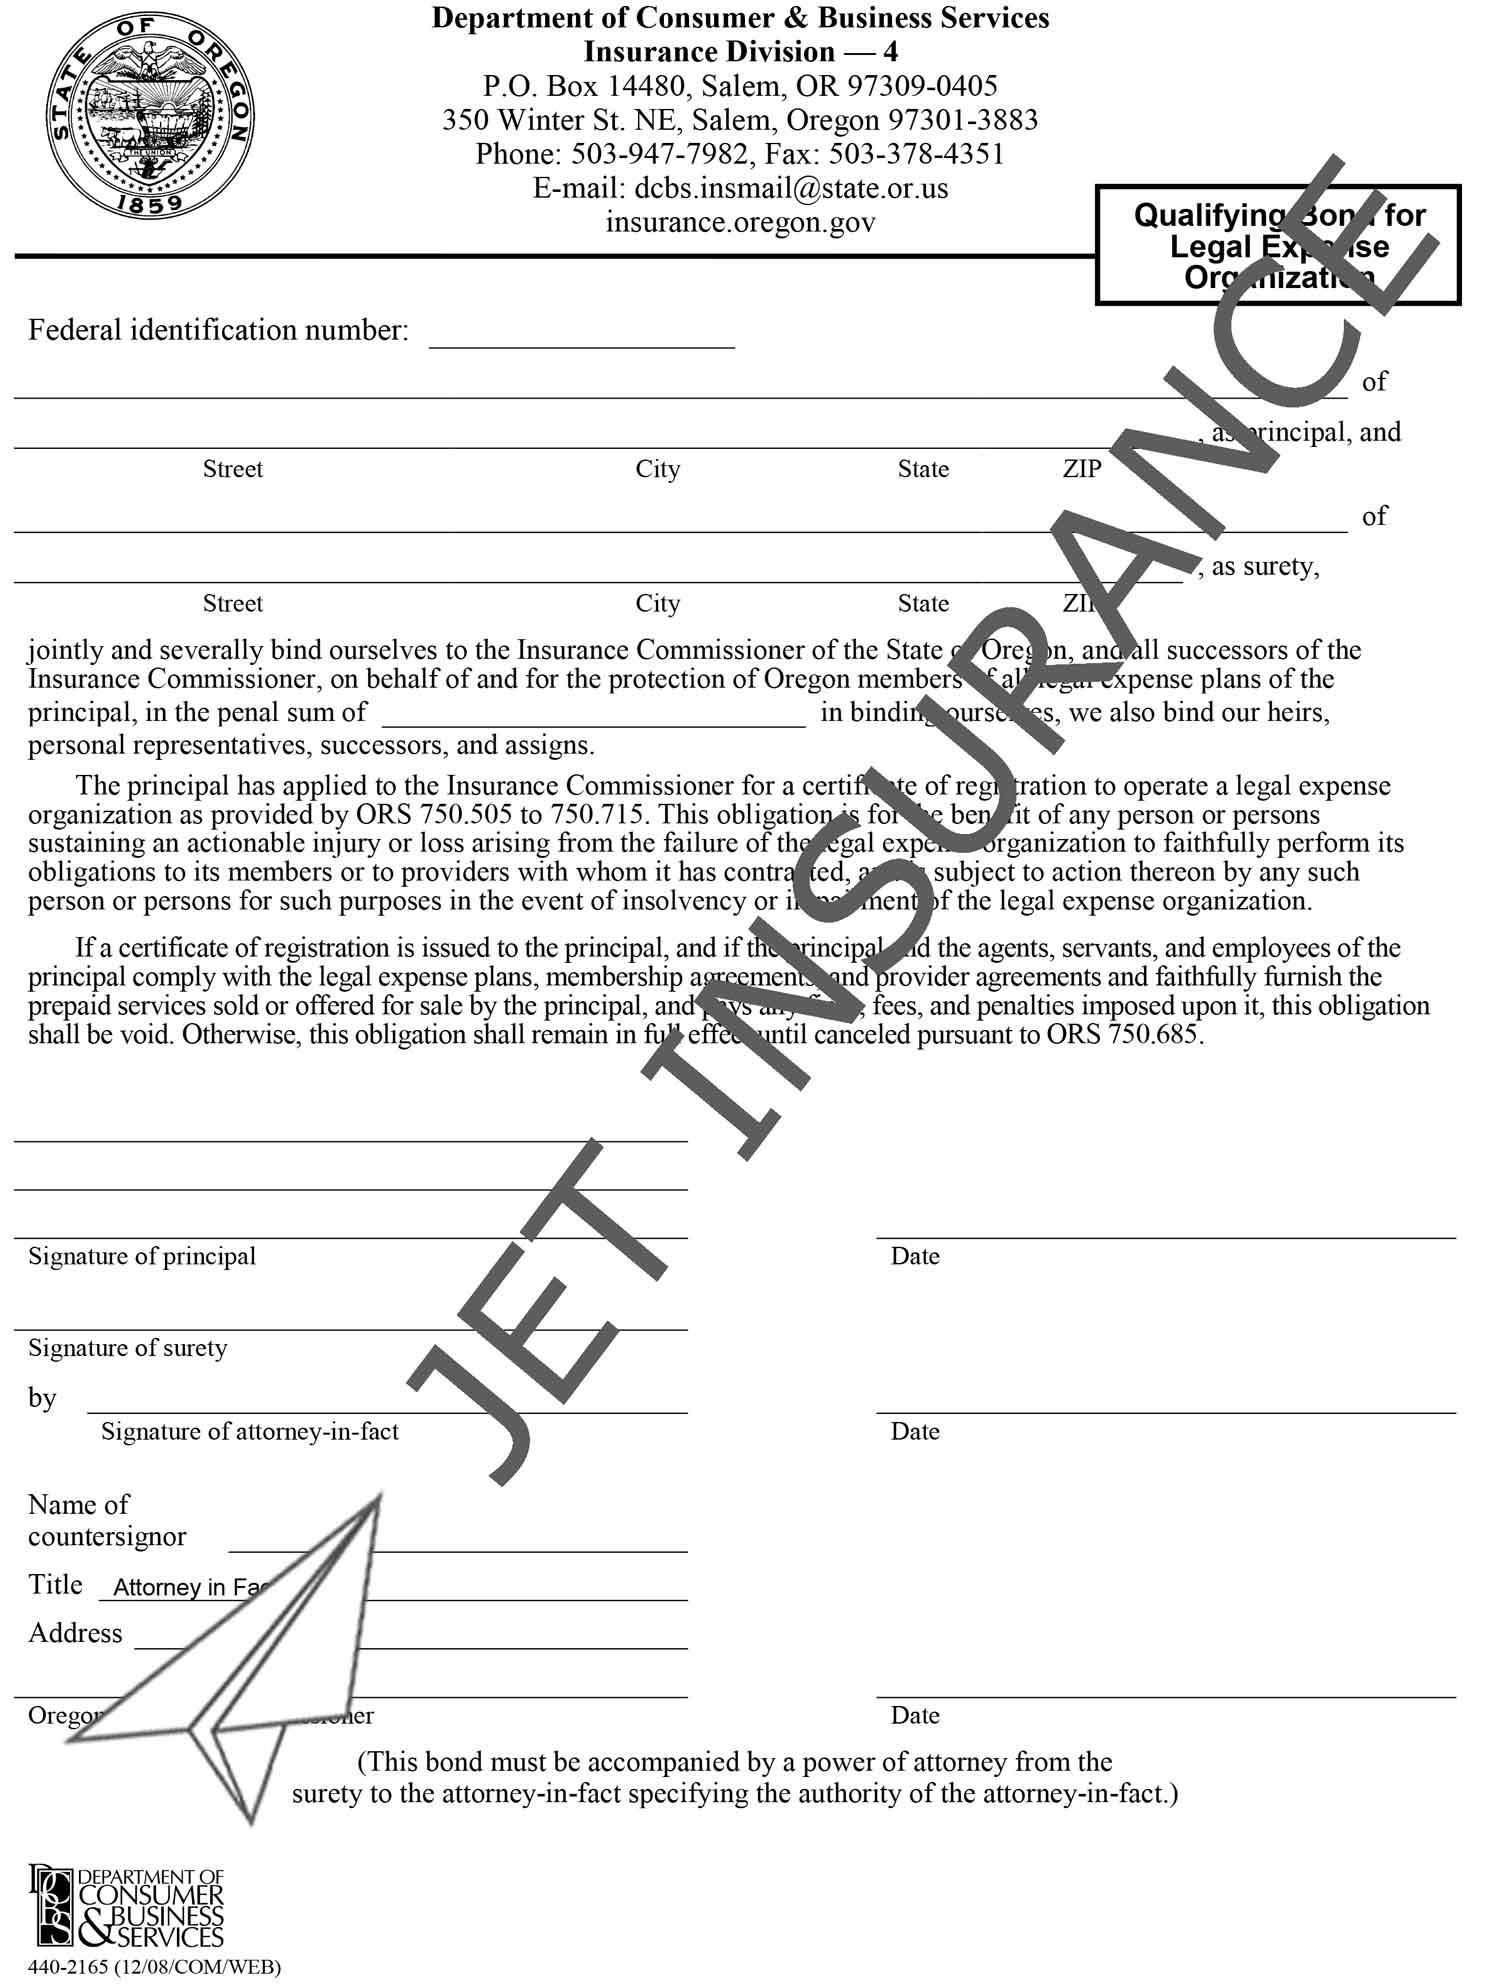 Oregon Legal Expense Bond Form